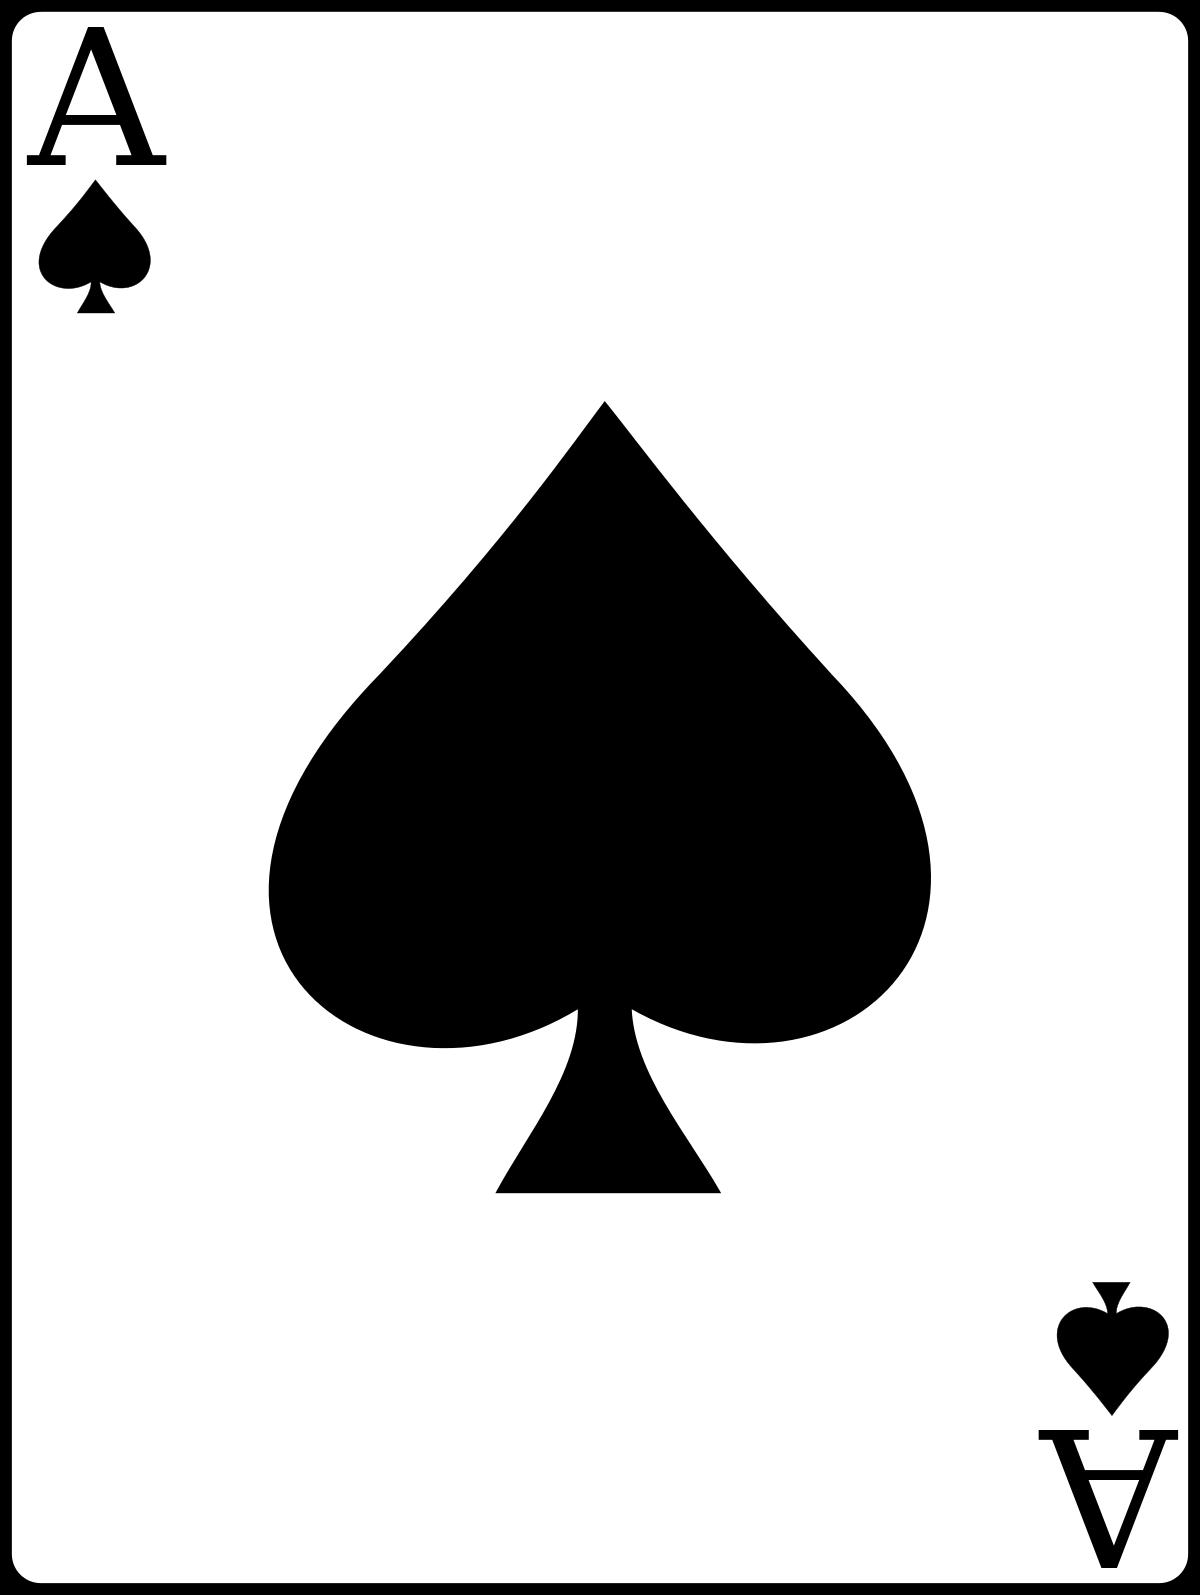 Spades Wikipedia Ace Of Spades Tattoo Ace Tattoo Ace Card